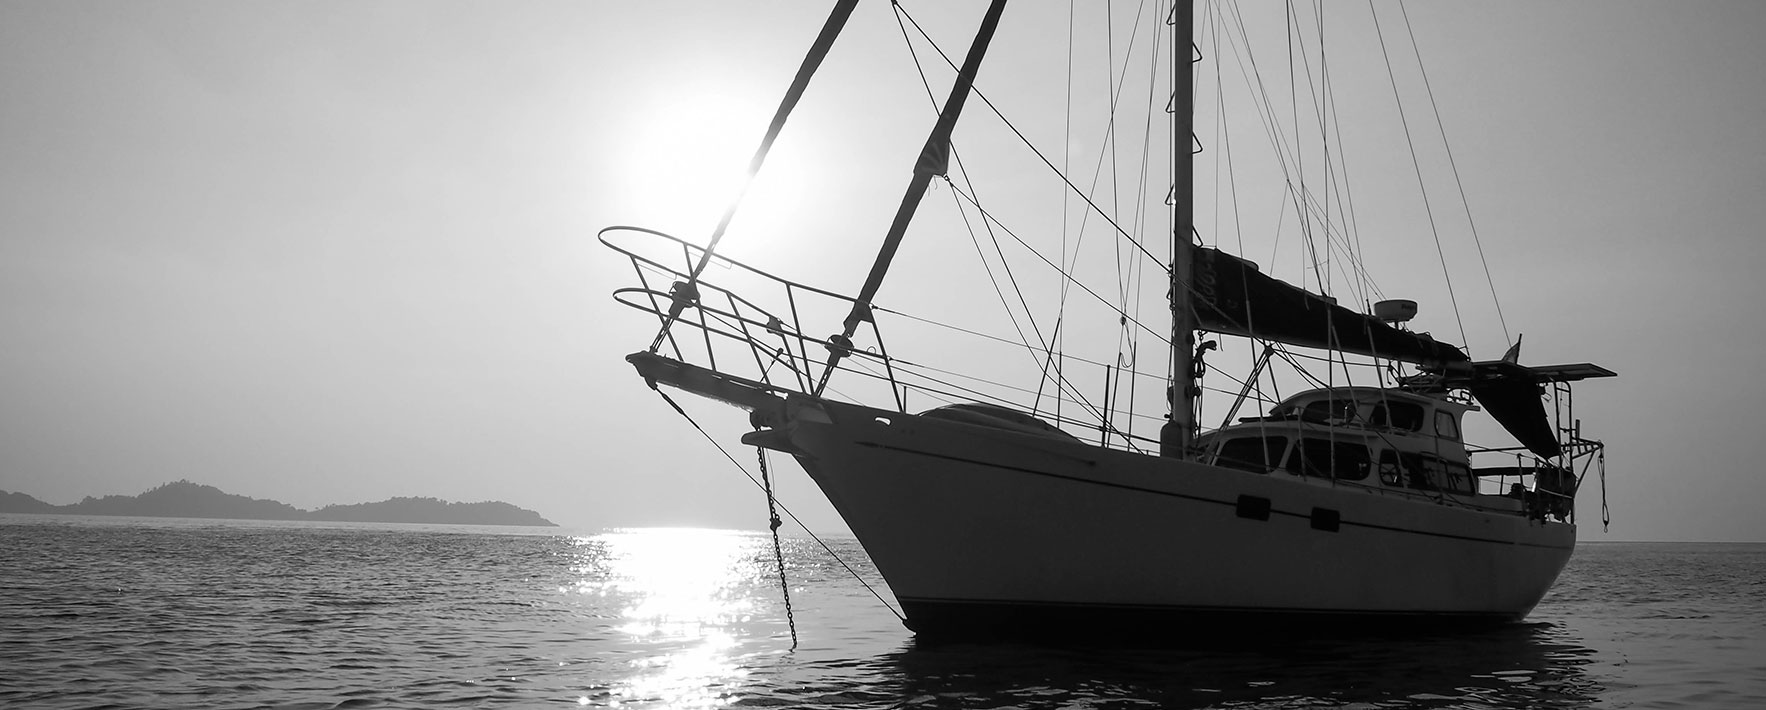 Chambre nationale des experts maritimes plaisance les - Chambre nationale des huissiers annonce ...